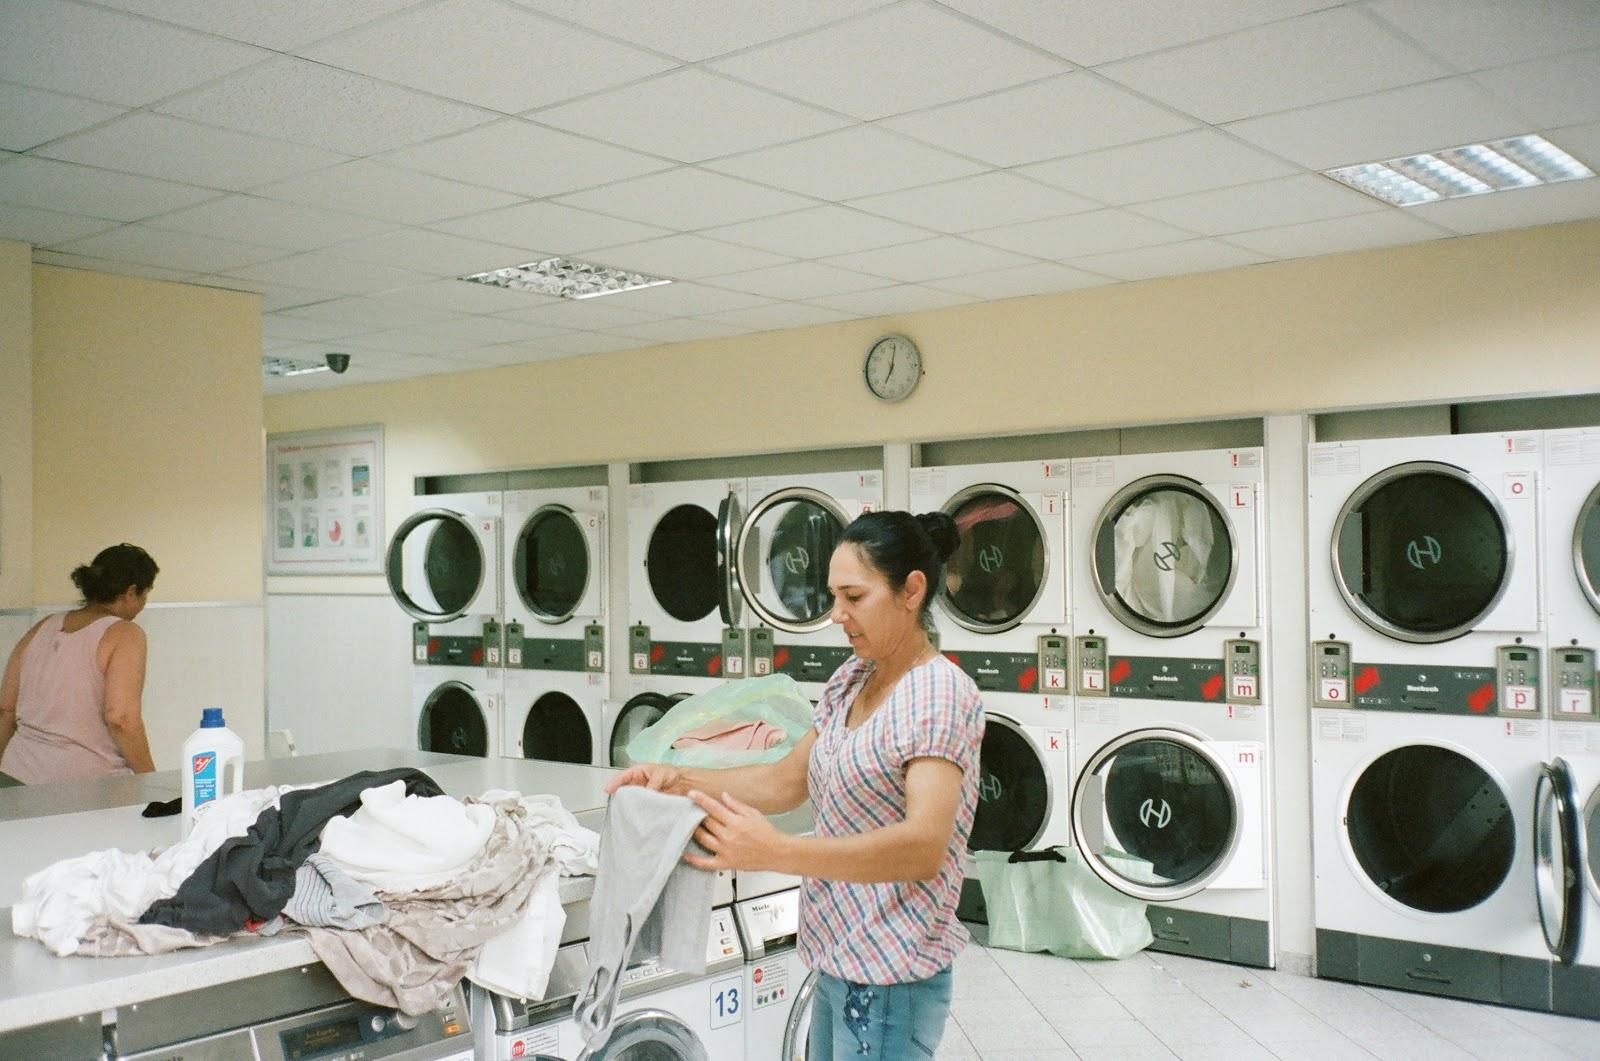 Lady folding laundry at a laundromat